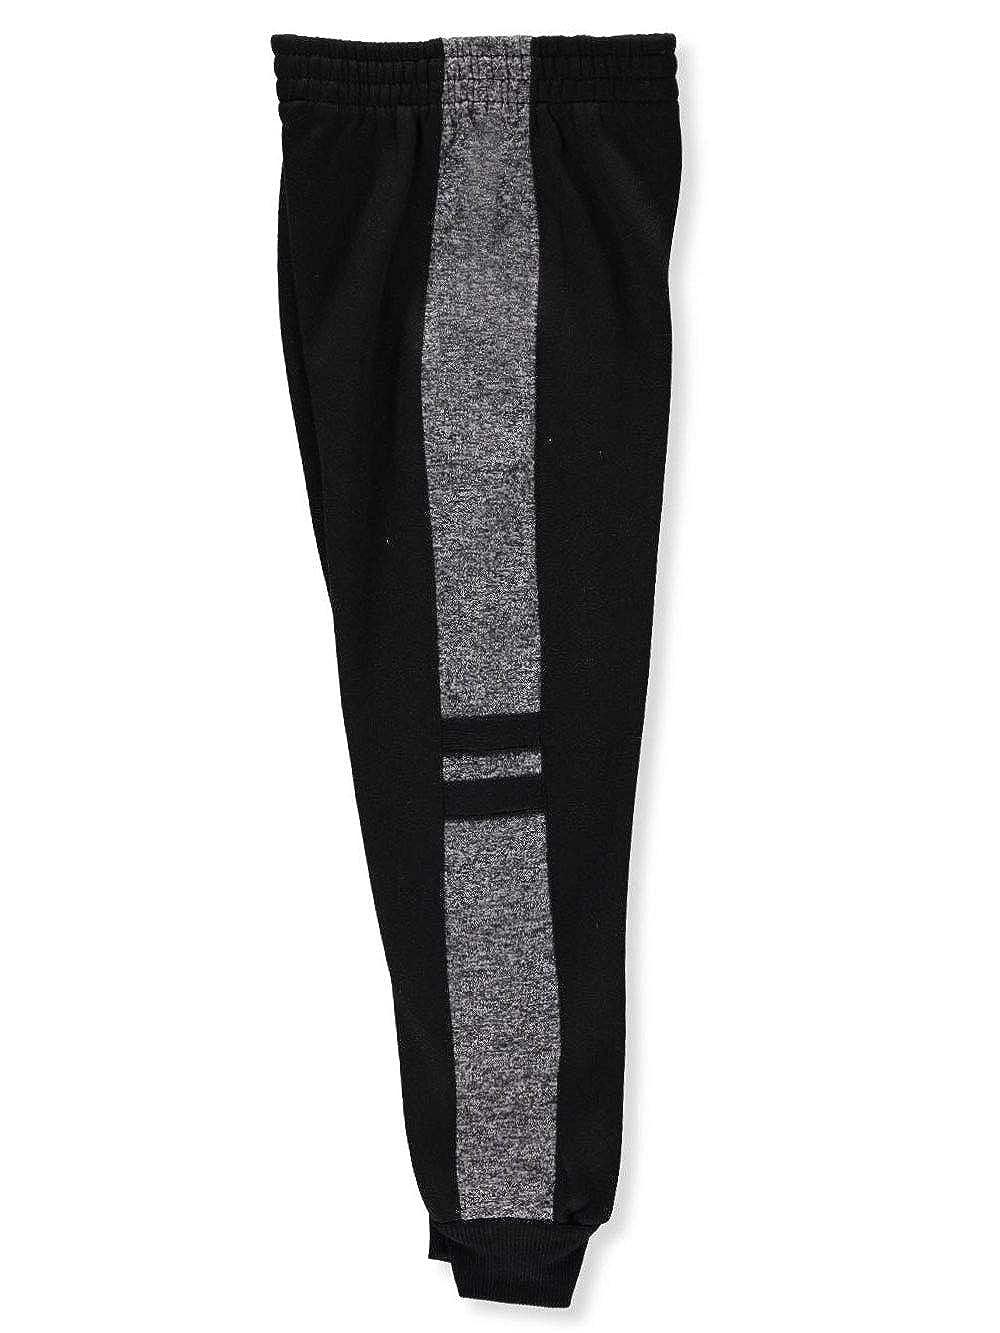 Amazon.com: Quad Seven - Conjunto de pantalones para niño (2 ...